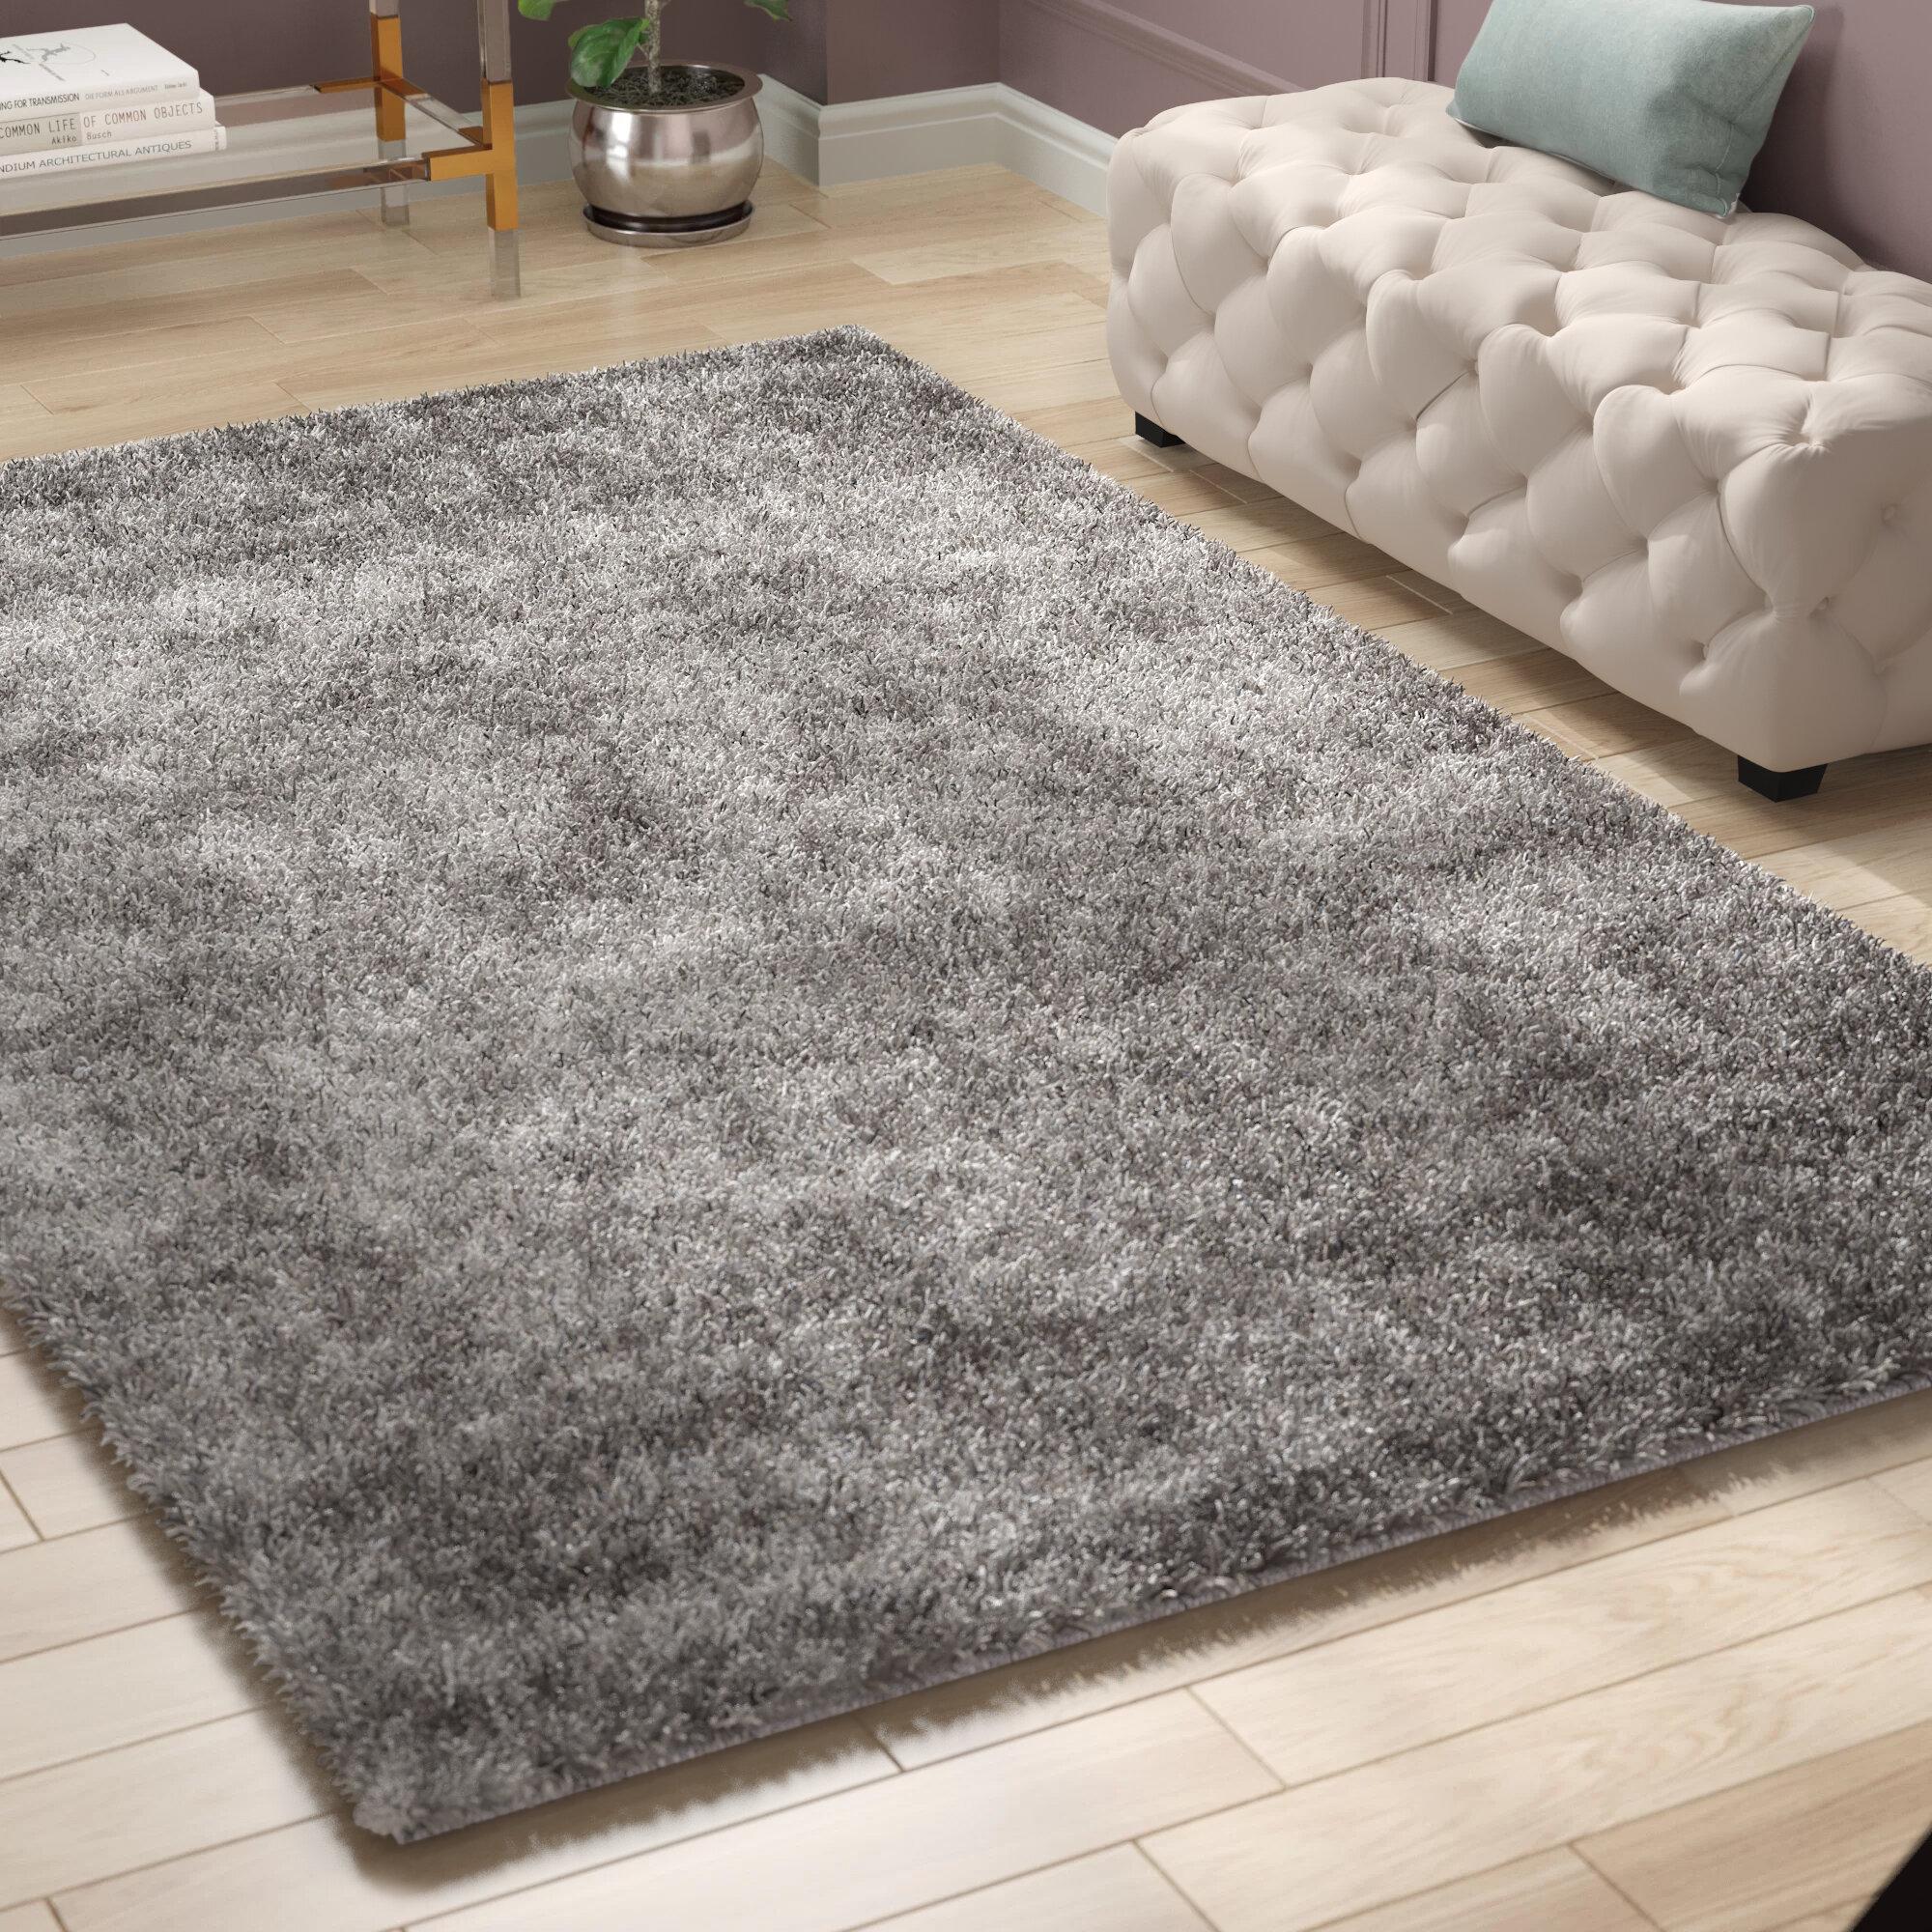 Willa Arlo Interiors Kater Handmade Tufted Gray Area Rug Reviews Wayfair